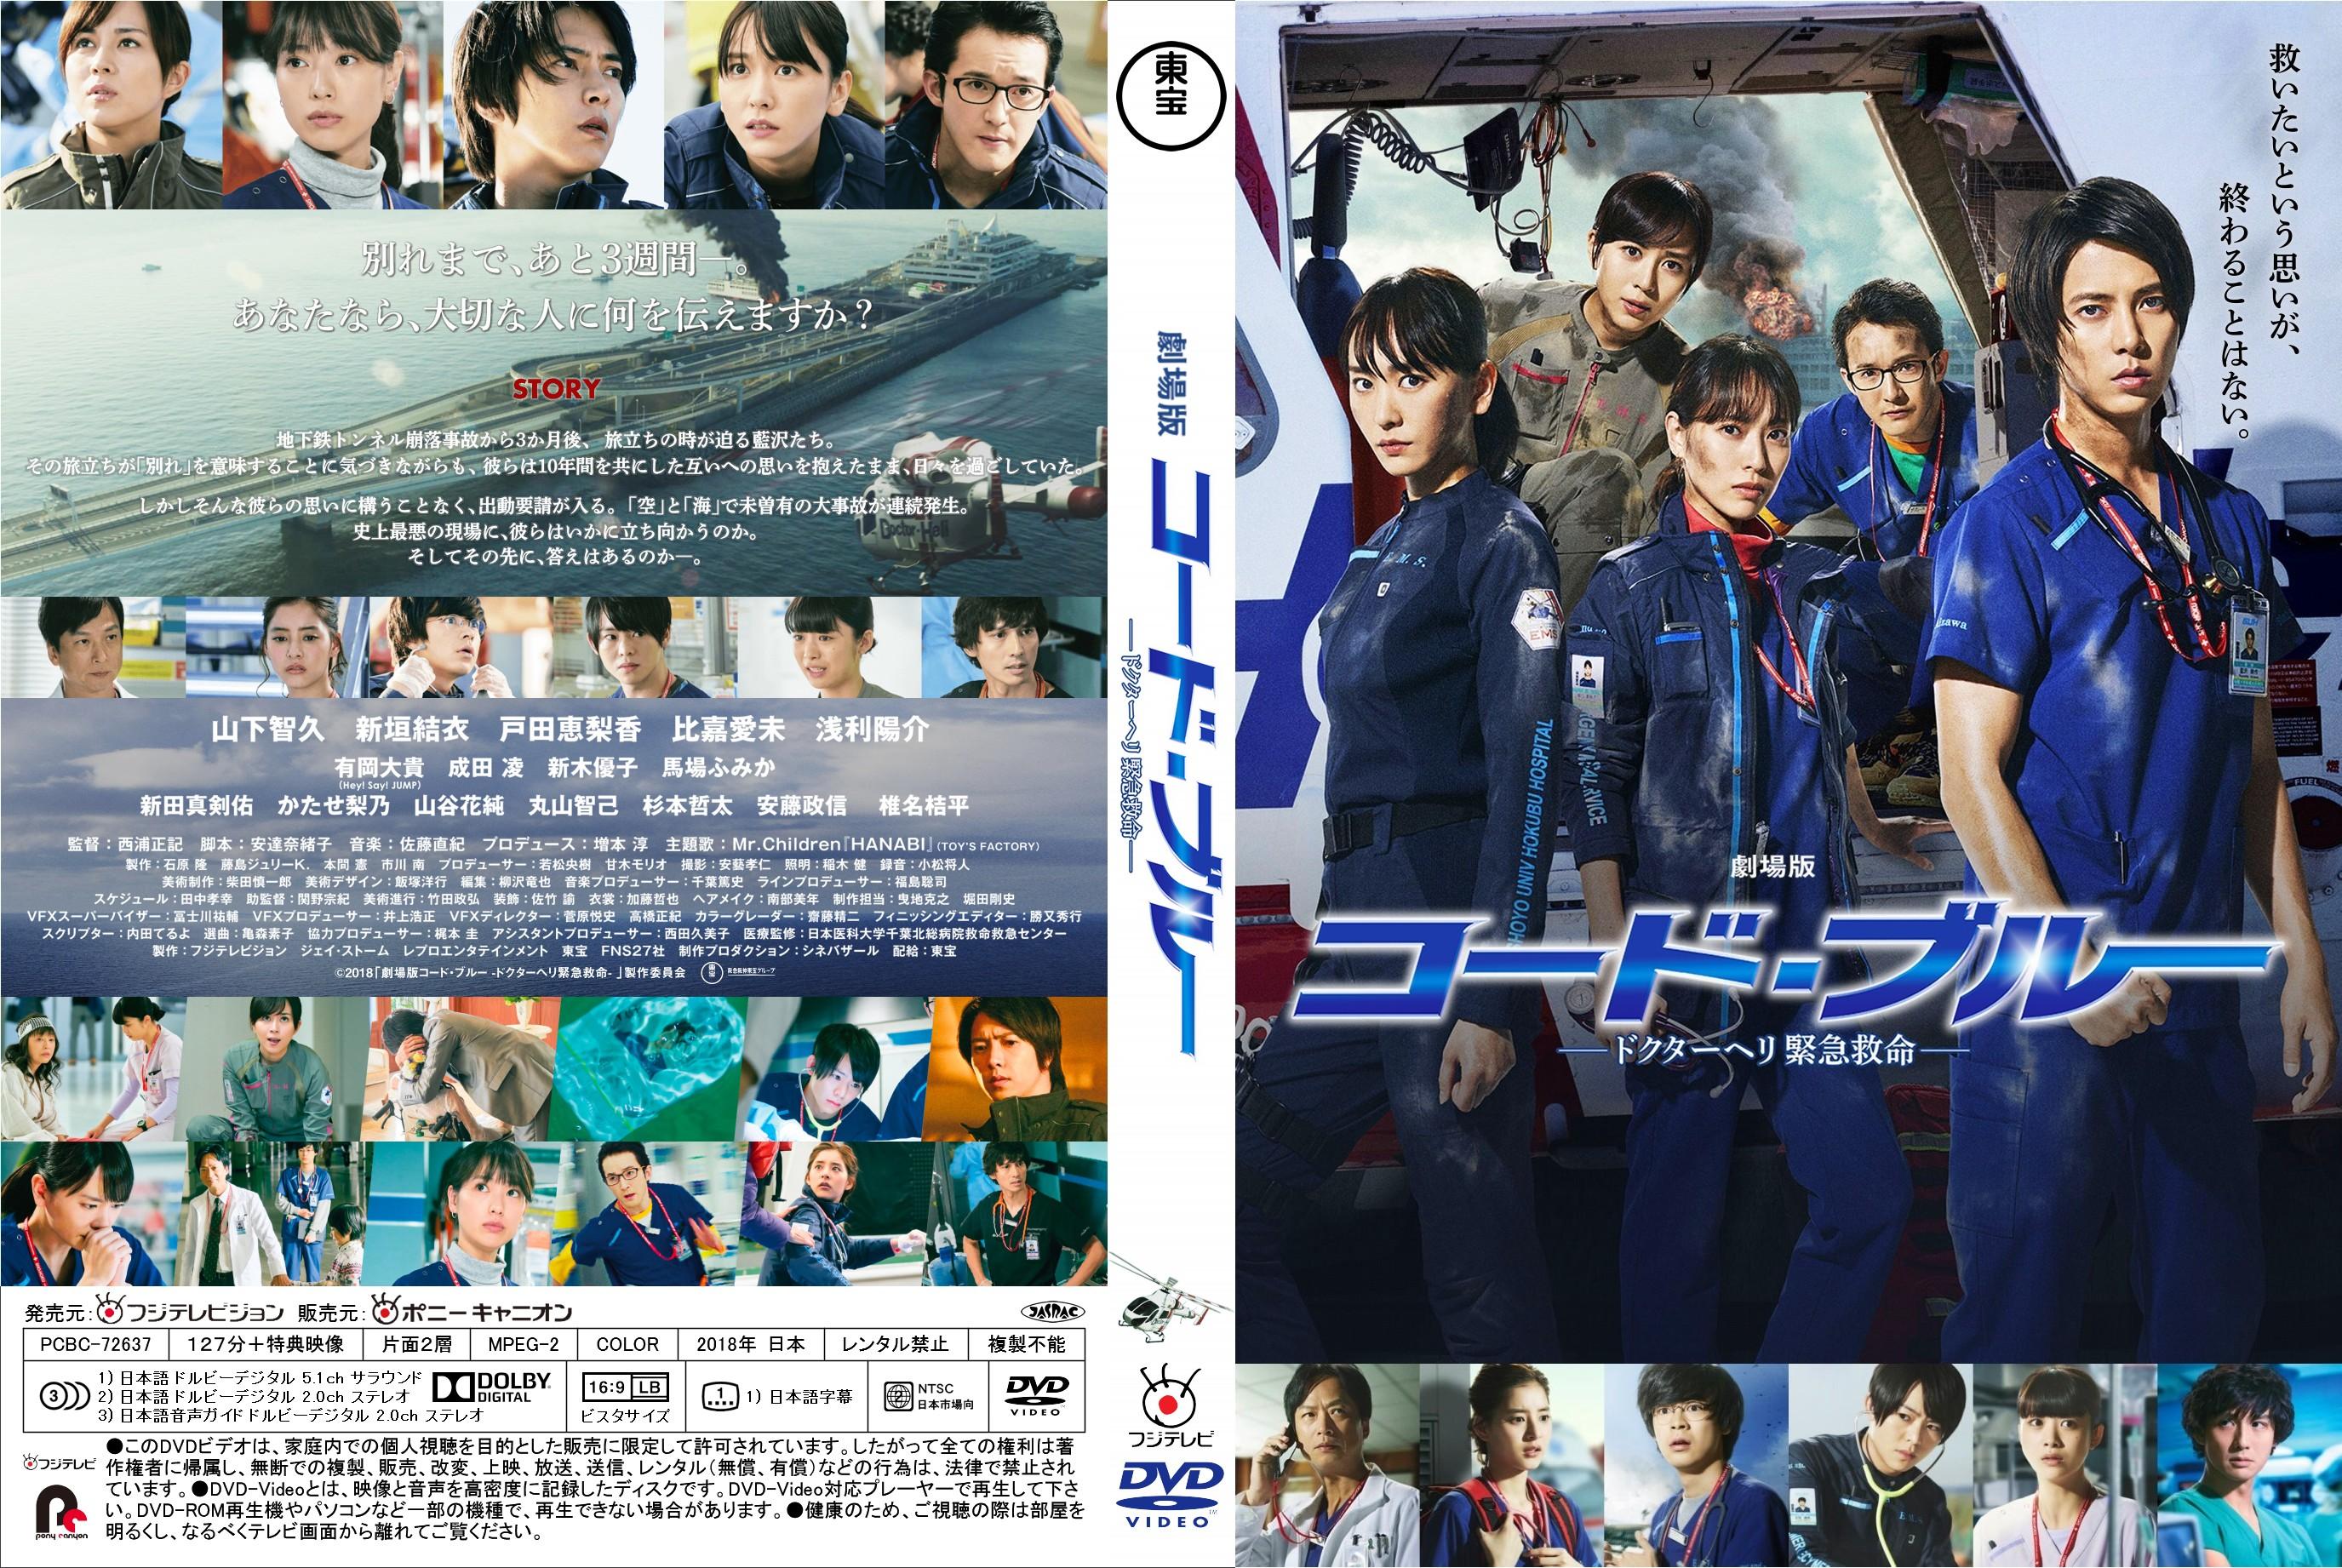 code_blue_movie_DVDj.jpg